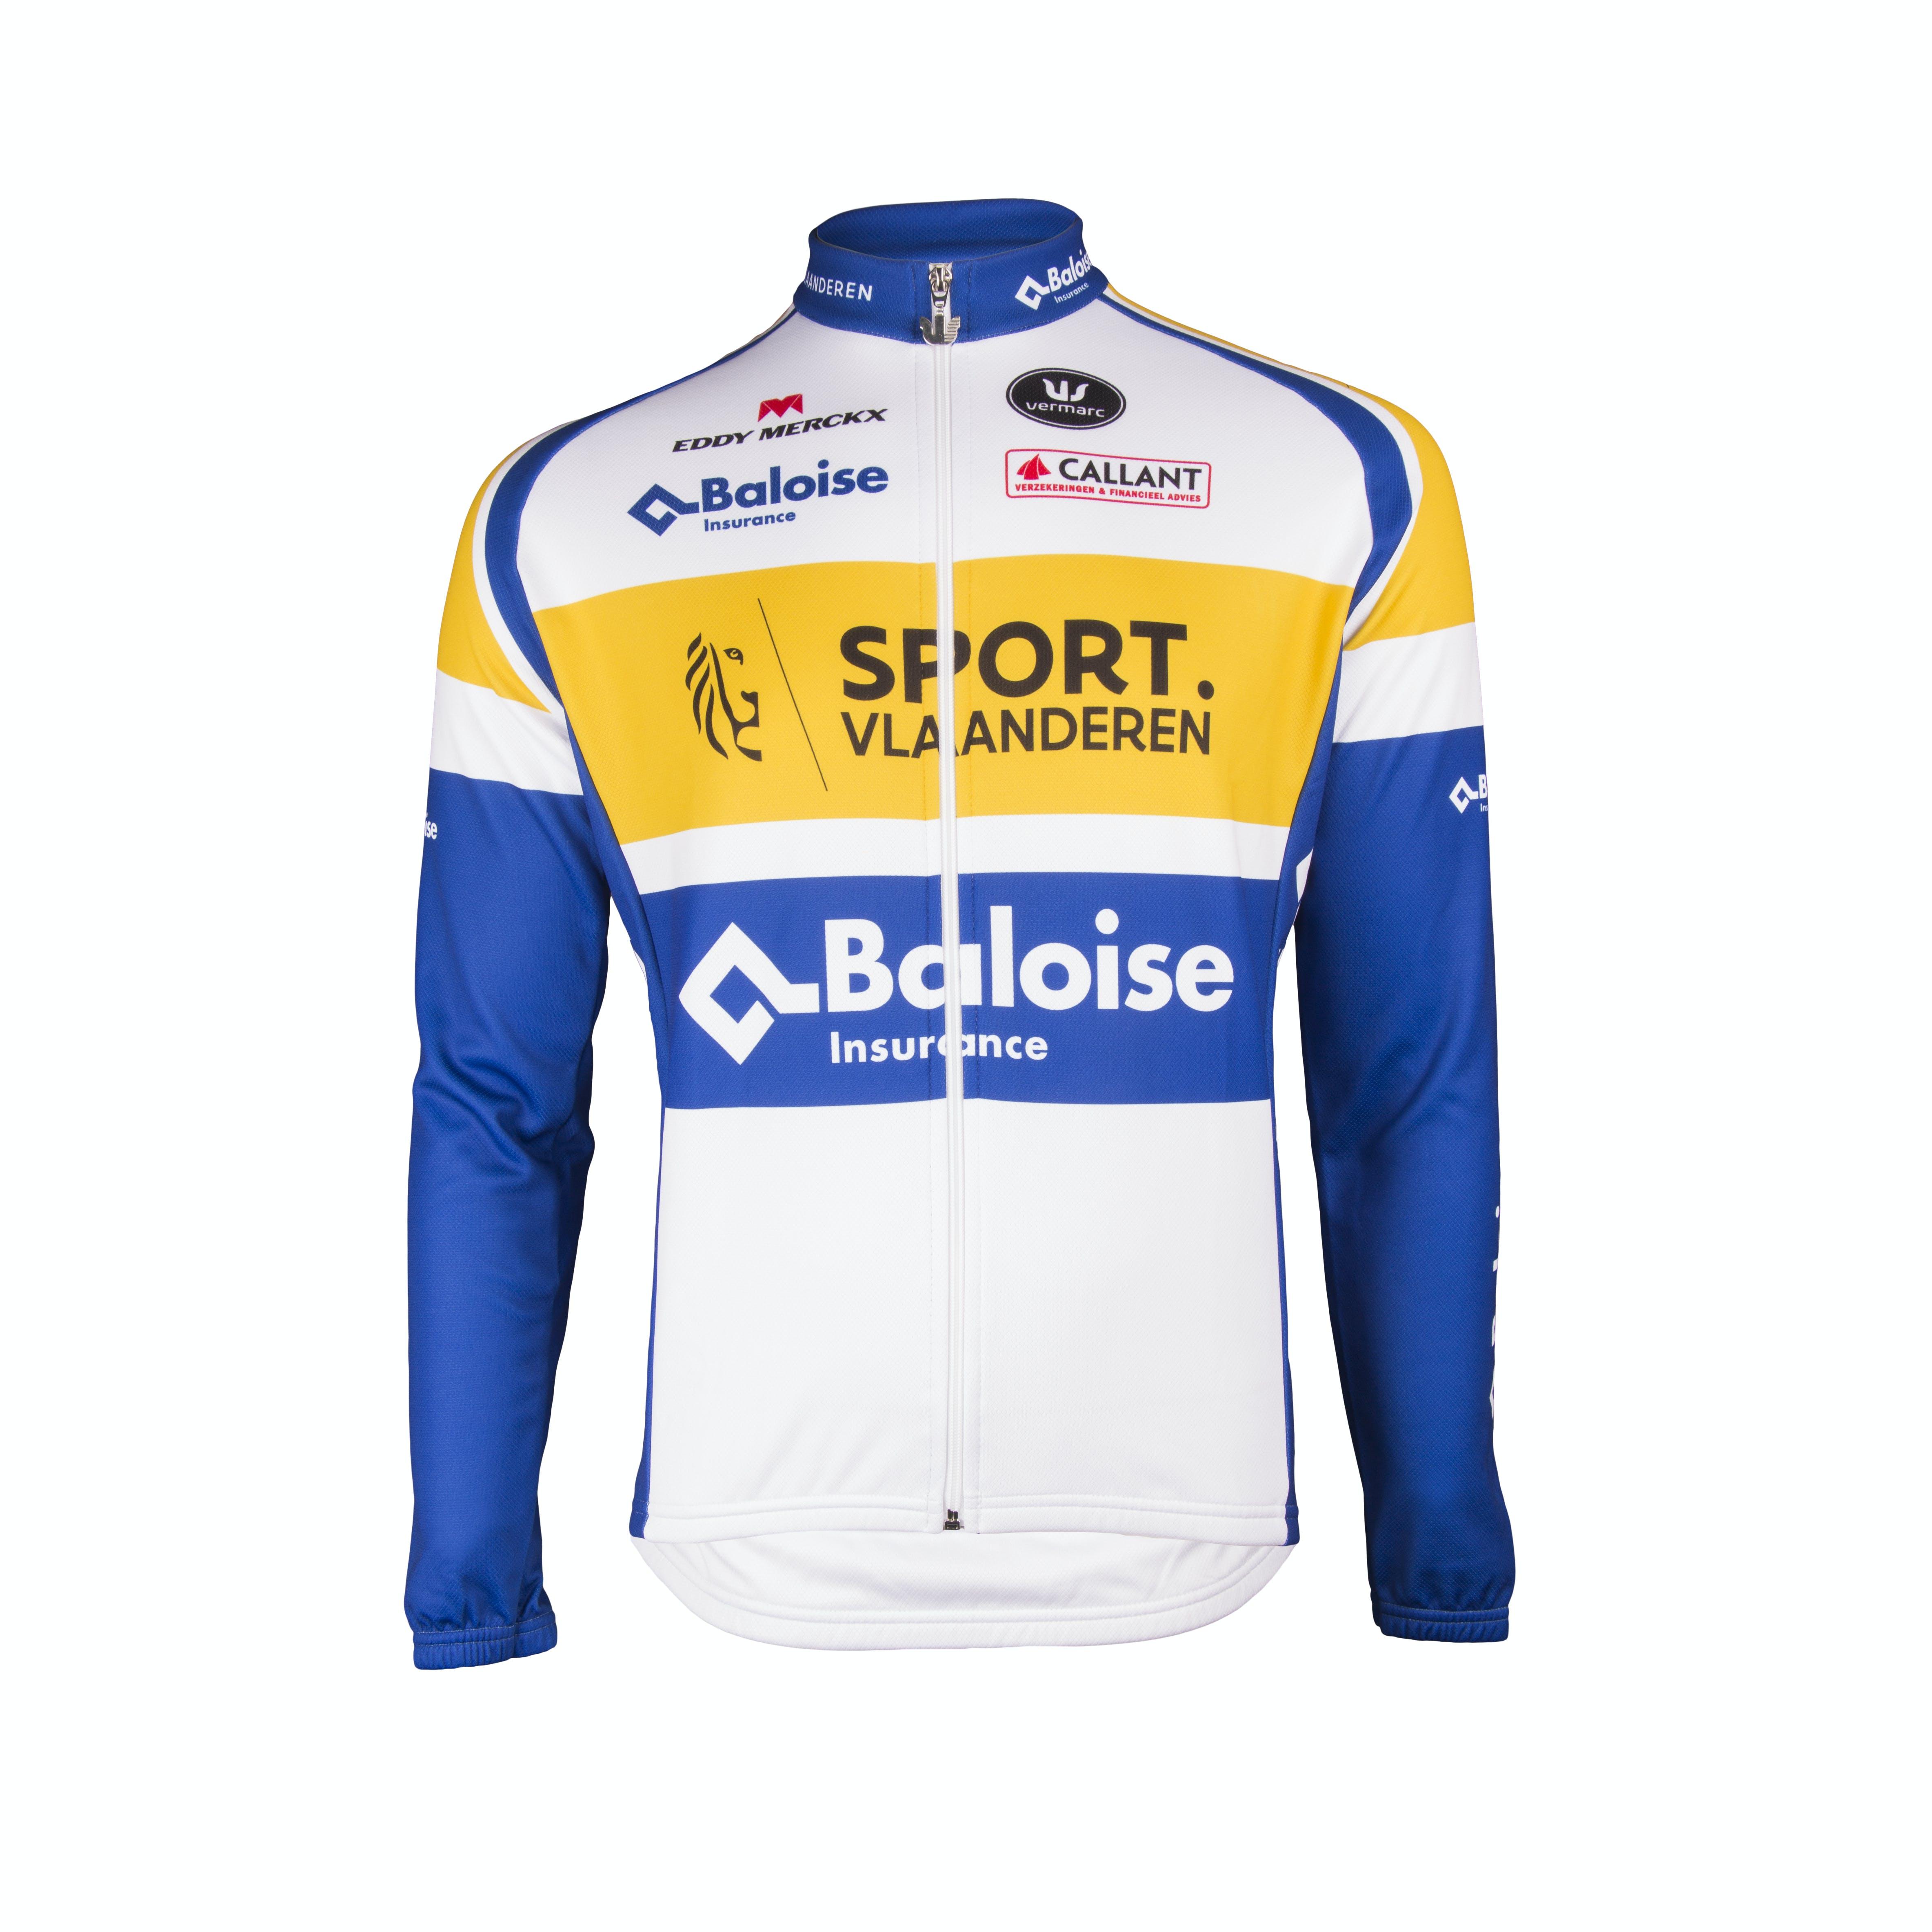 Sport Vlaanderen Baloise 2018 Jersey Long Sleeves